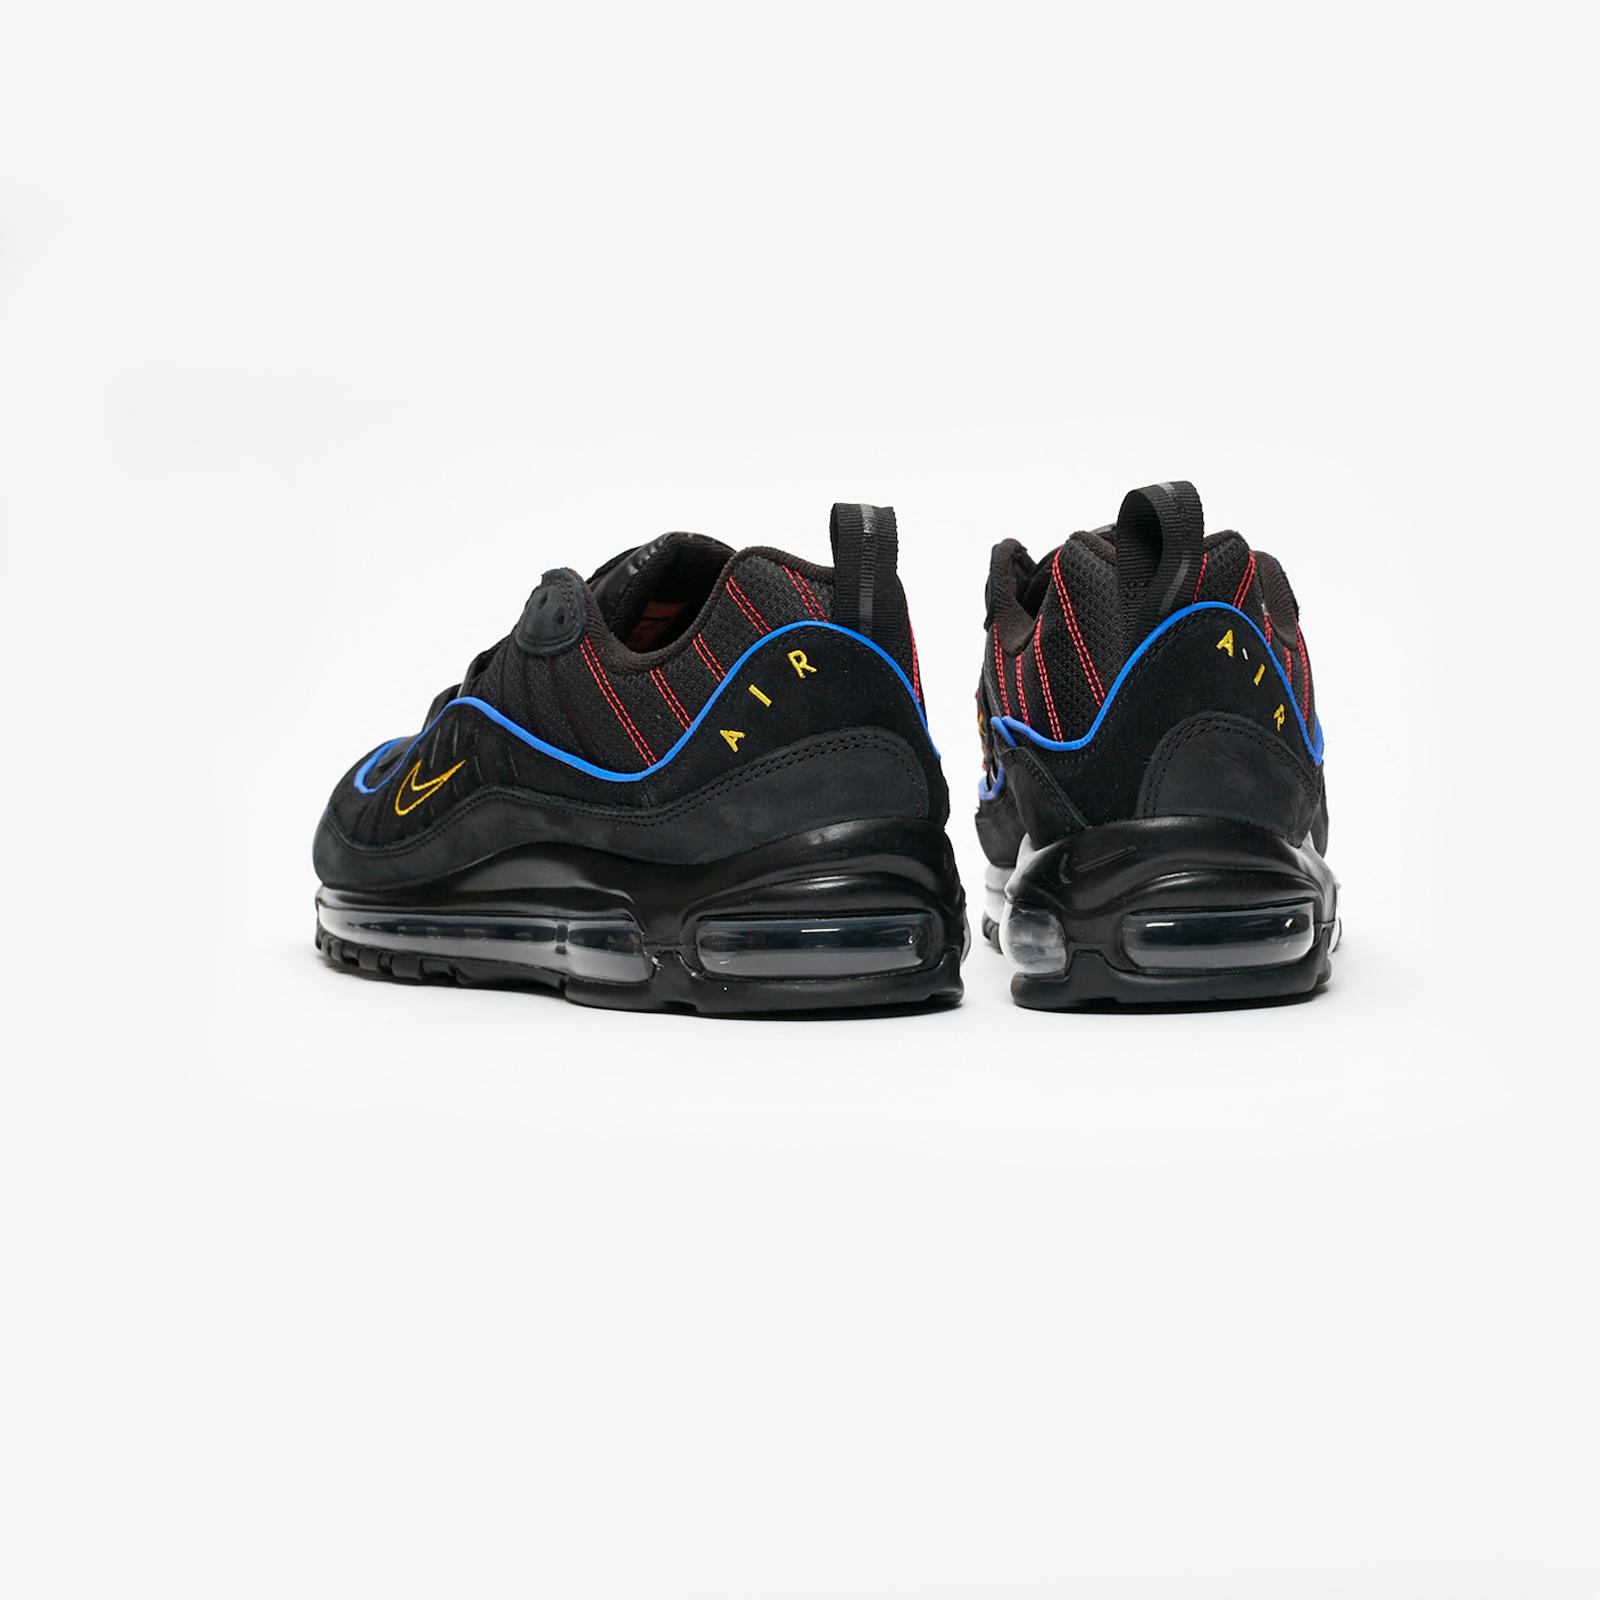 half off ed45e 3a6f8 Nike Air Max 98 - Cd1537-001 - Sneakersnstuff   sneakers   streetwear  online since 1999